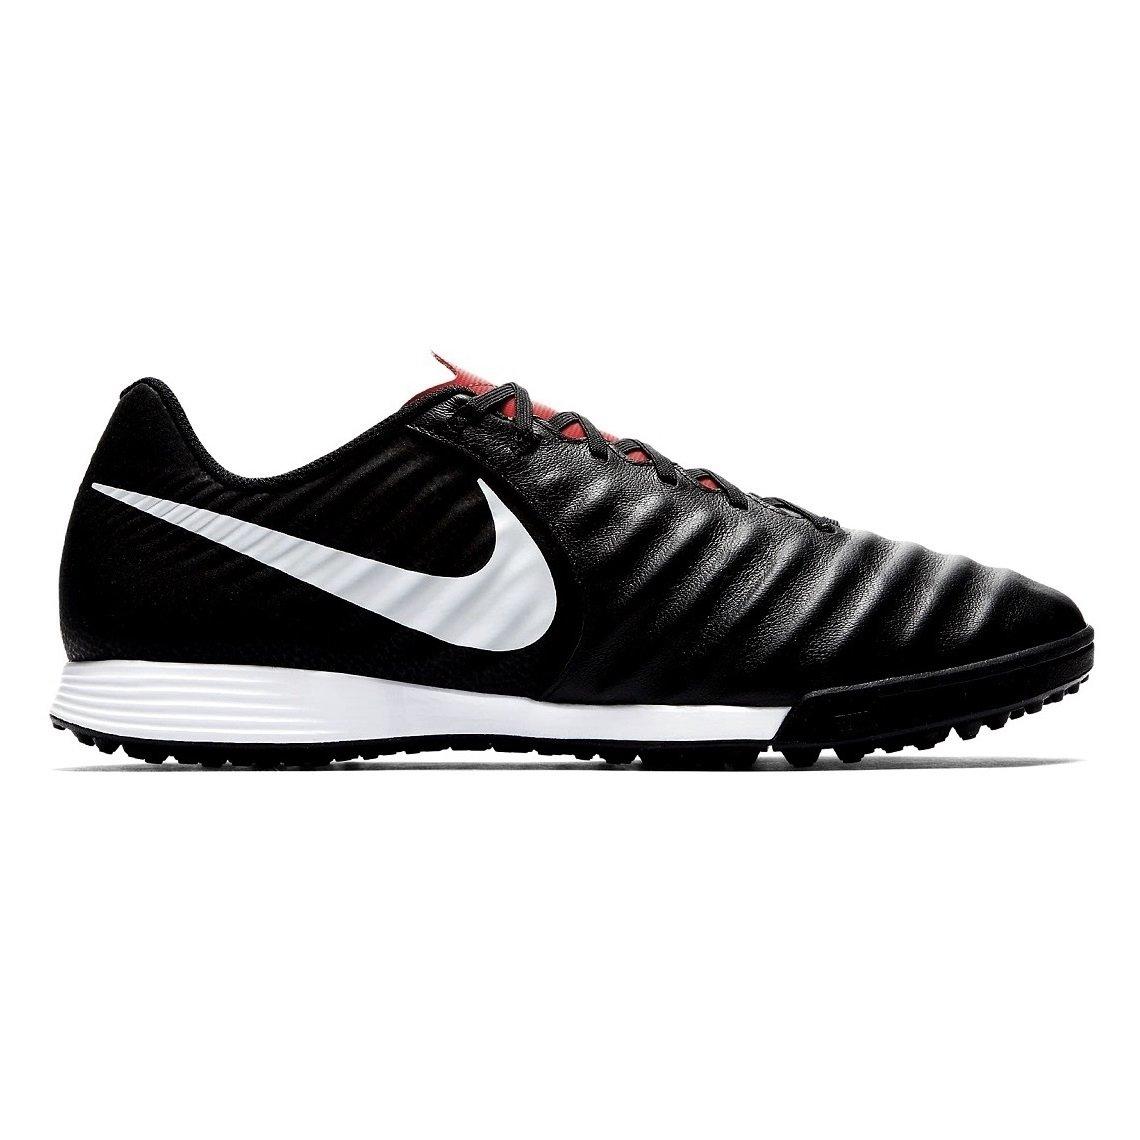 5d18a0fdfe Amplie a imagem. Chuteira Society Nike TiempoX Legend 7 Academy  Chuteira  Society Nike TiempoX ...